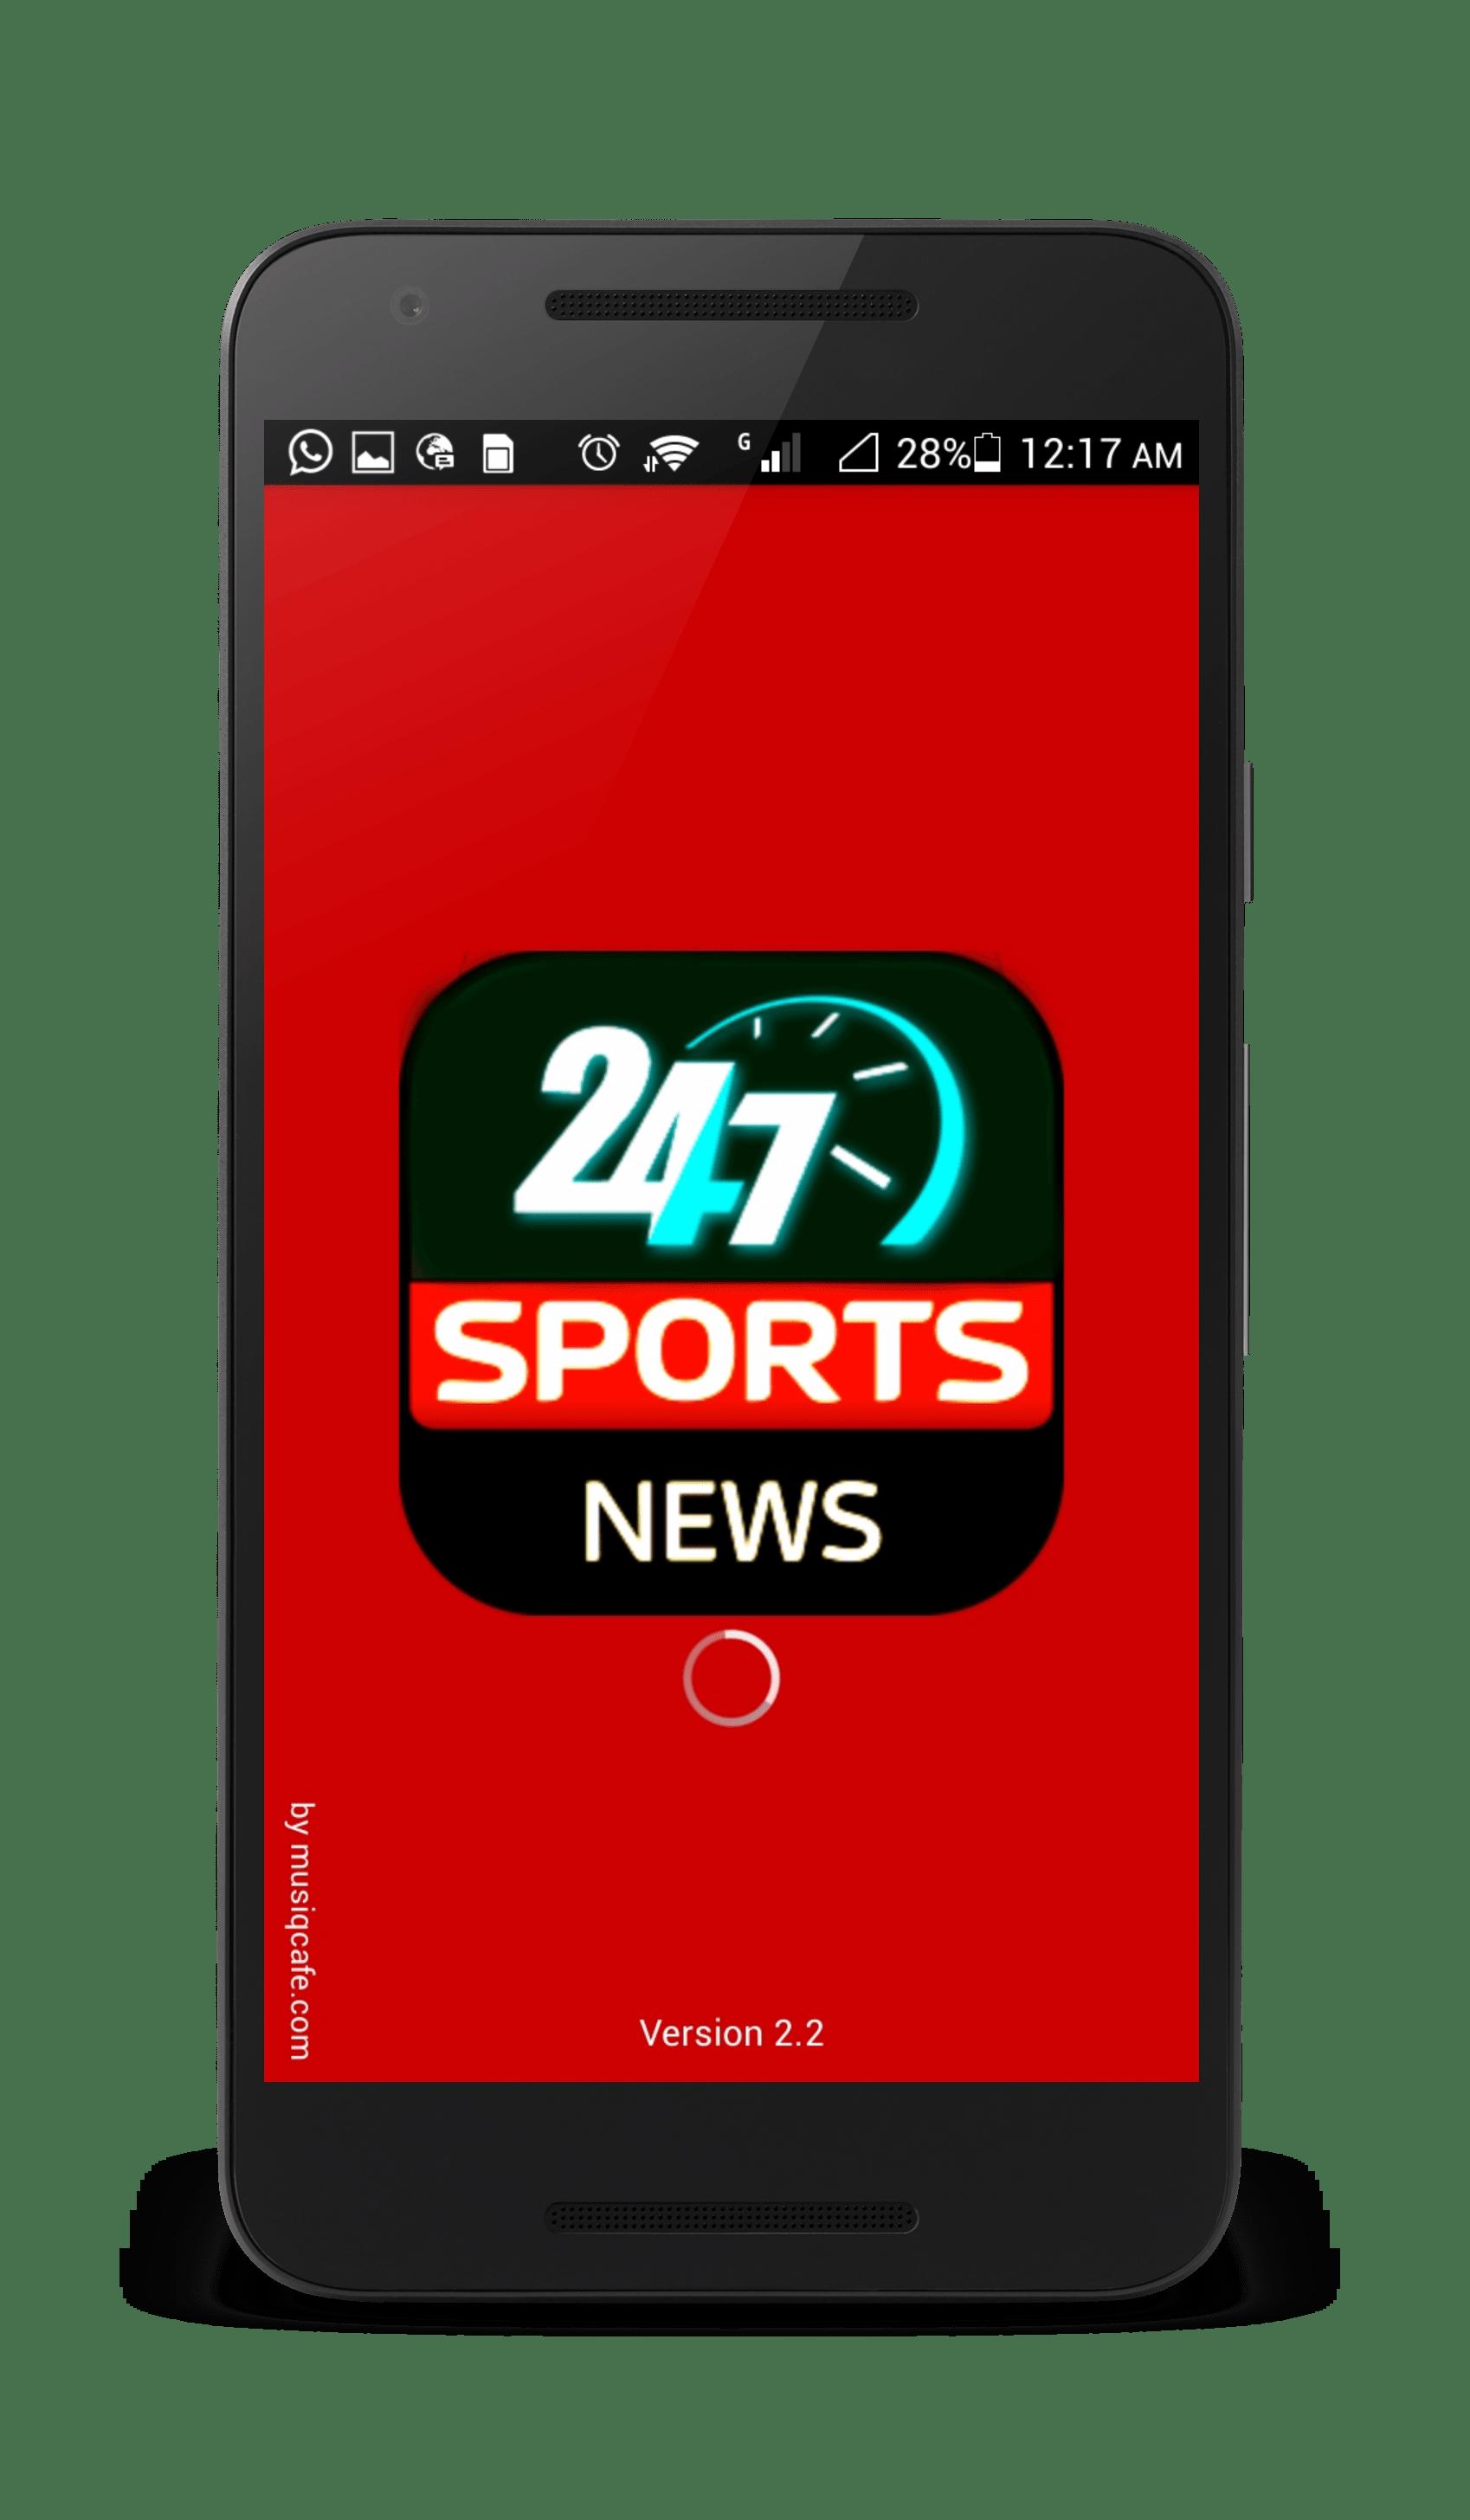 Live Sports 24 7